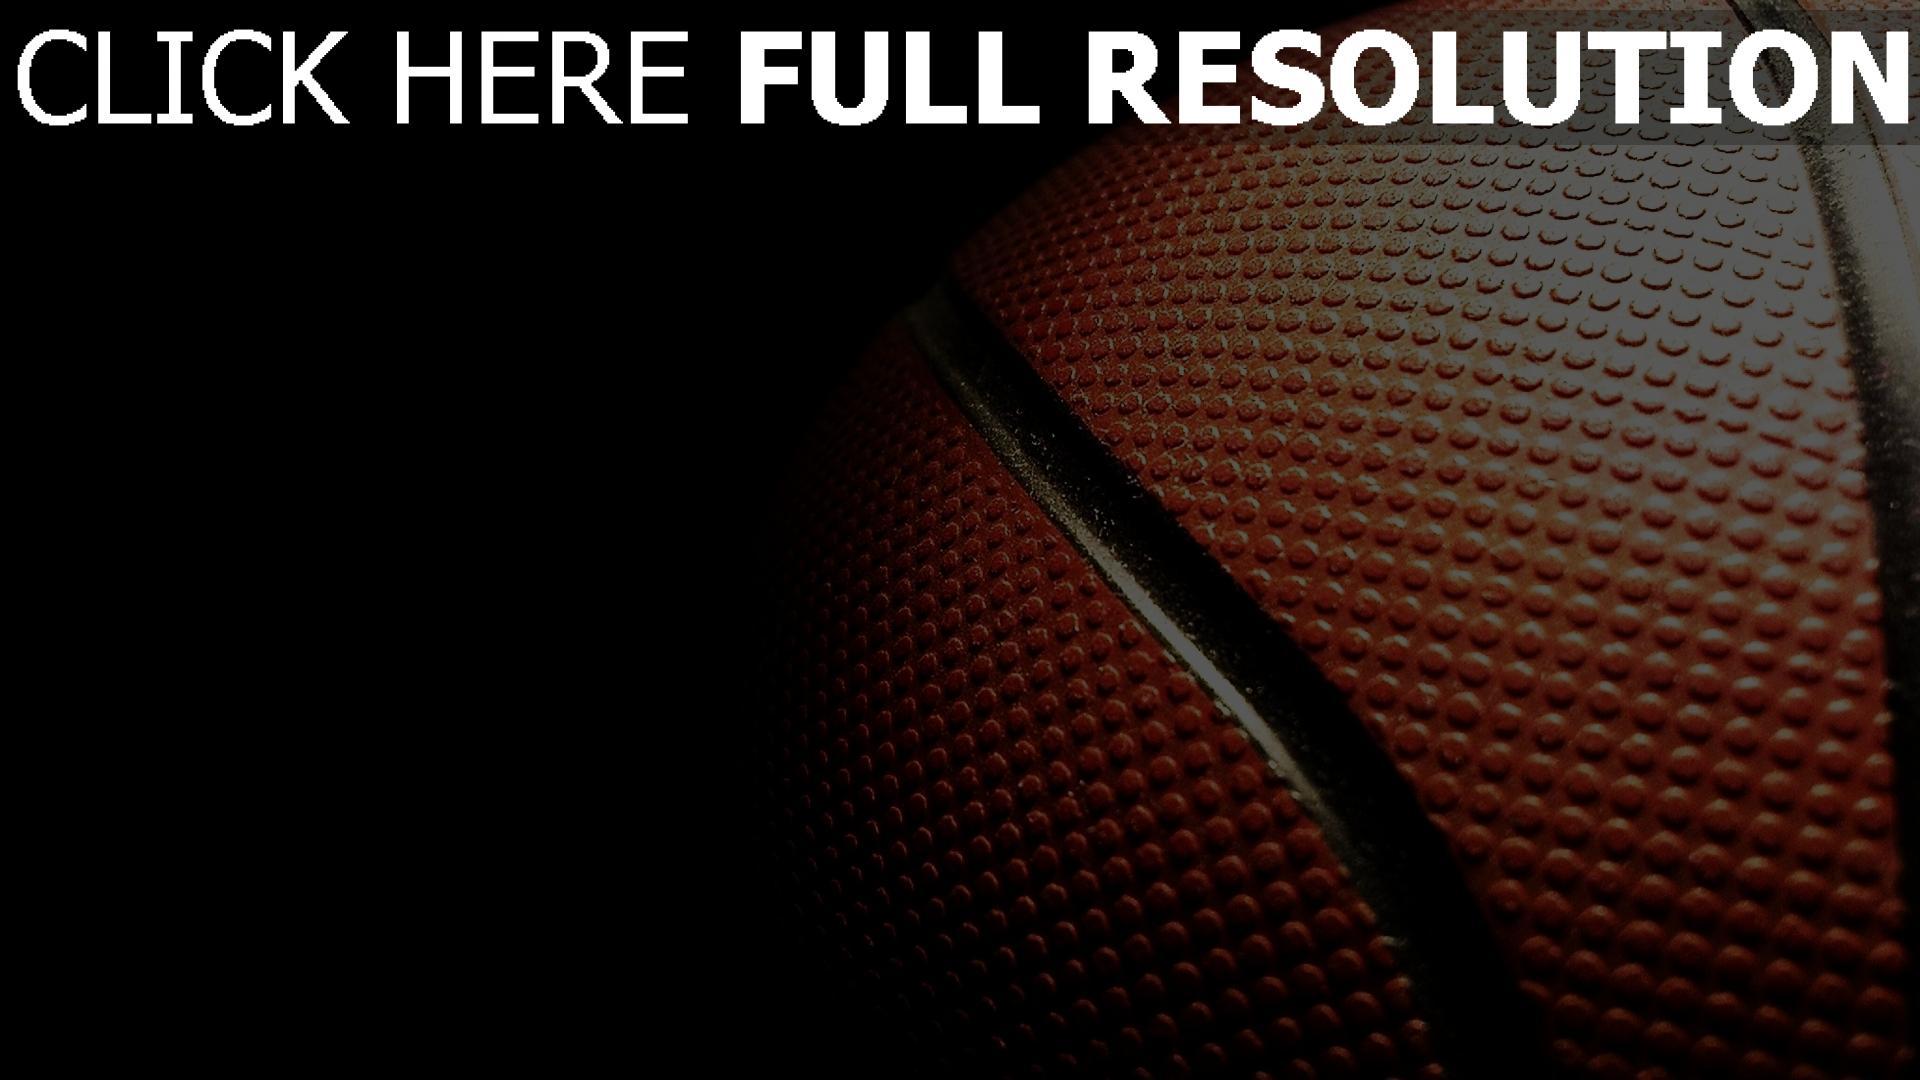 fond d'écran 1920x1080 basket-ball balle gros plan